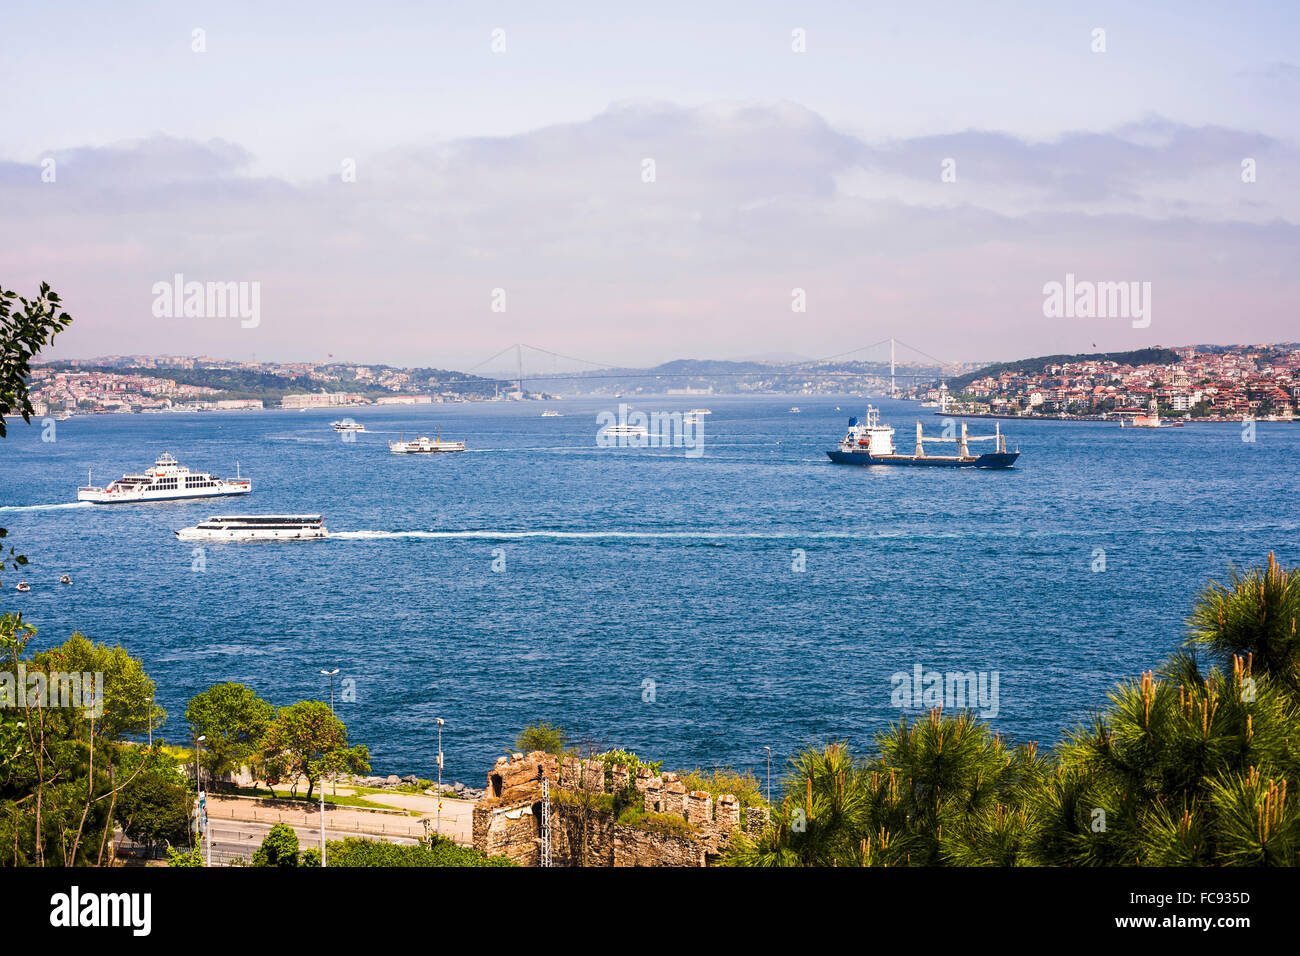 Bosphorus Strait, with European Istanbul on left and Asian Istanbul on right, Istanbul, Turkey, Europe, Eurasia - Stock Image